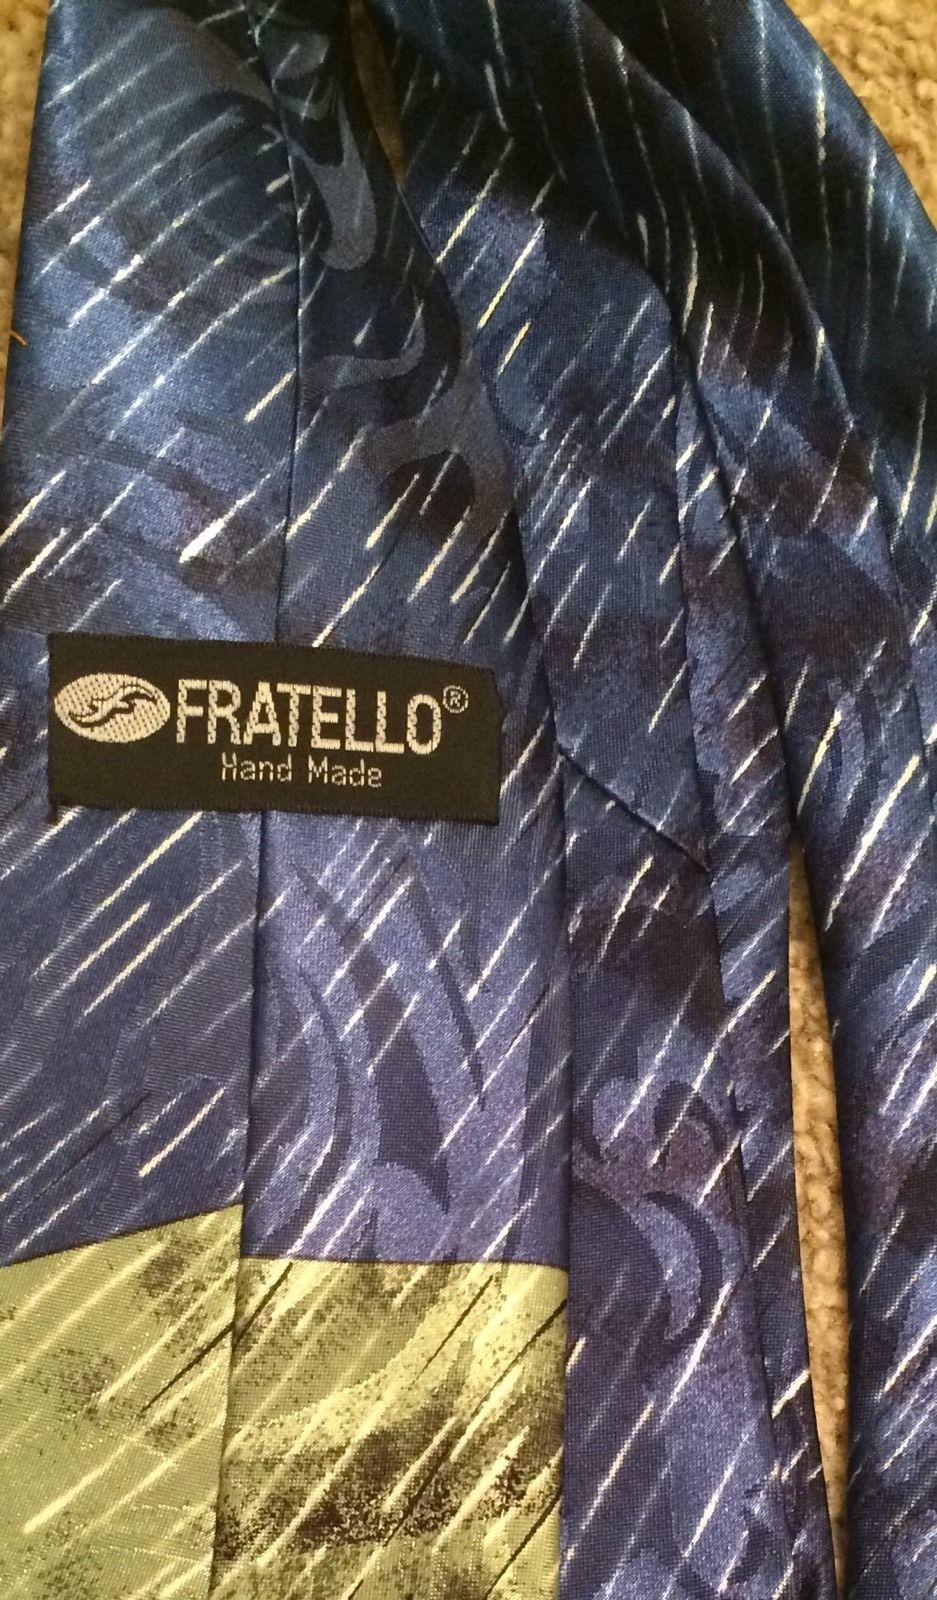 Fratello Necktie Rainy Days Golfing  image 3